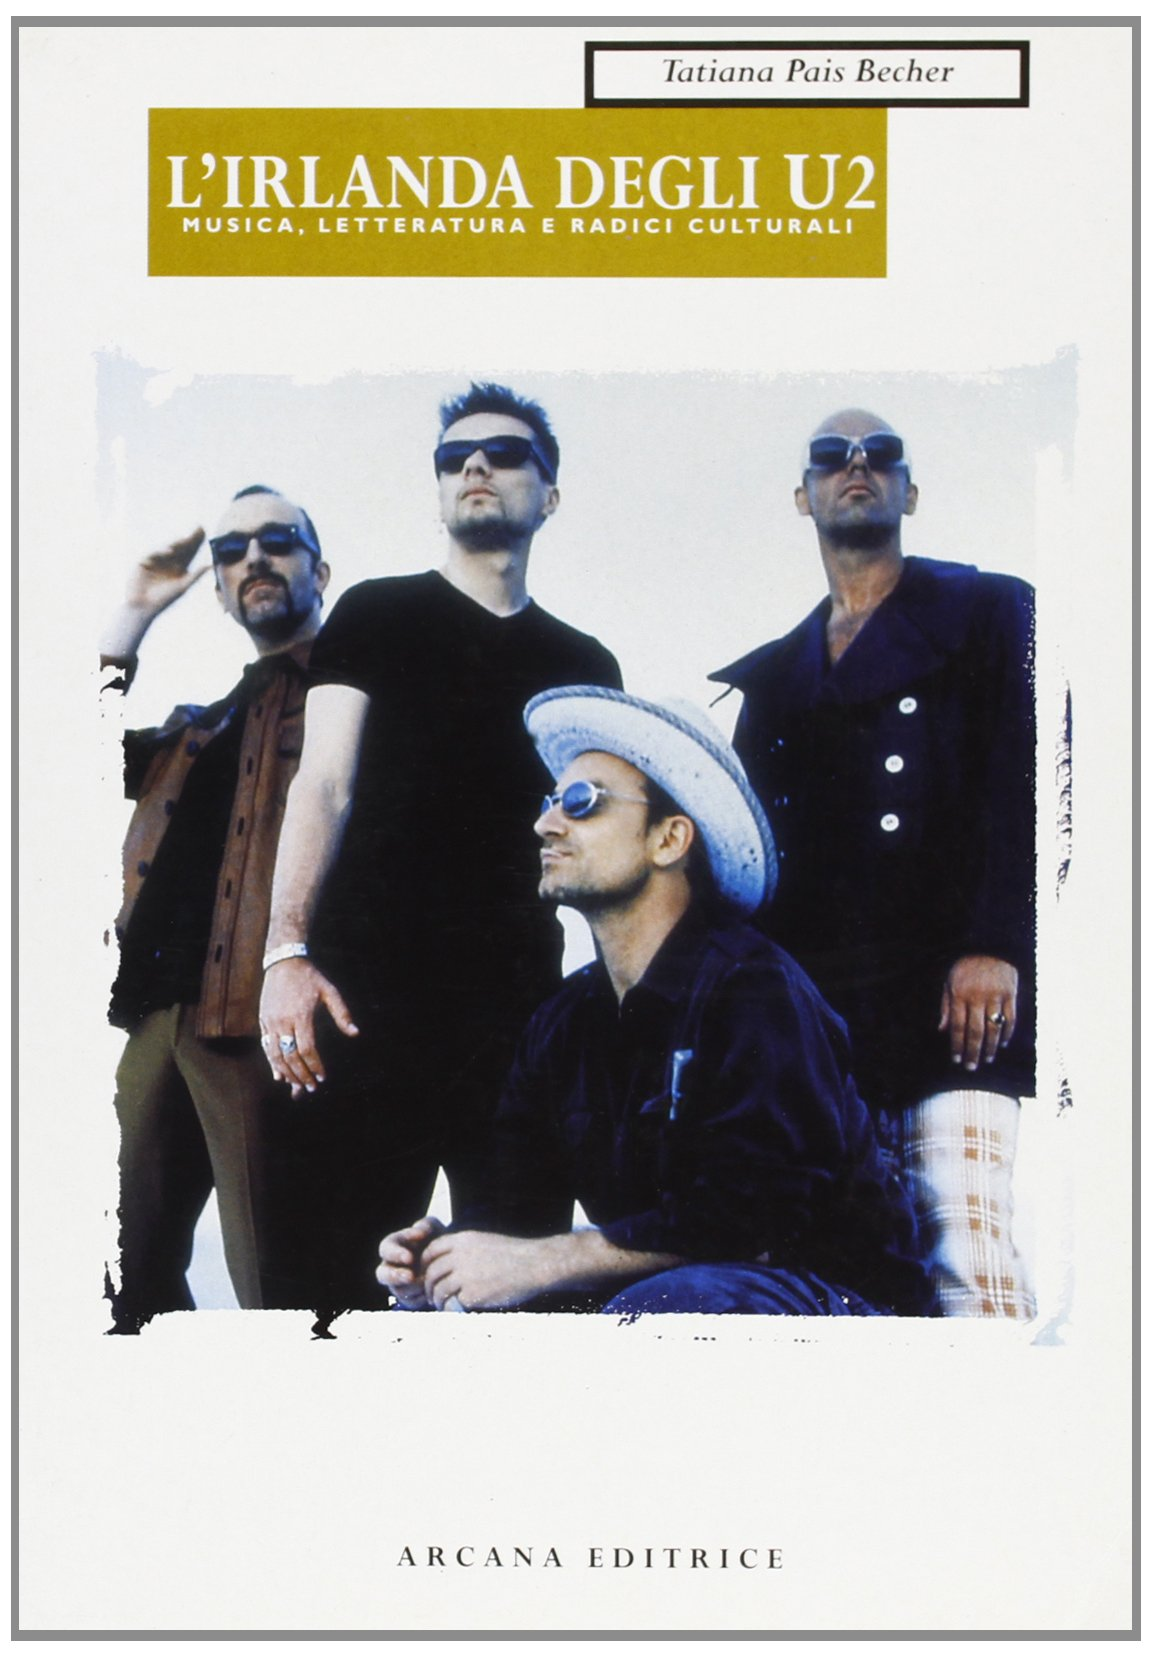 L'Irlanda degli U2. Musica, letteratura e radici culturali Copertina flessibile – 9 gen 2001 Tatiana Pais Becher E. Guaitamacchi Arcana 8879661736